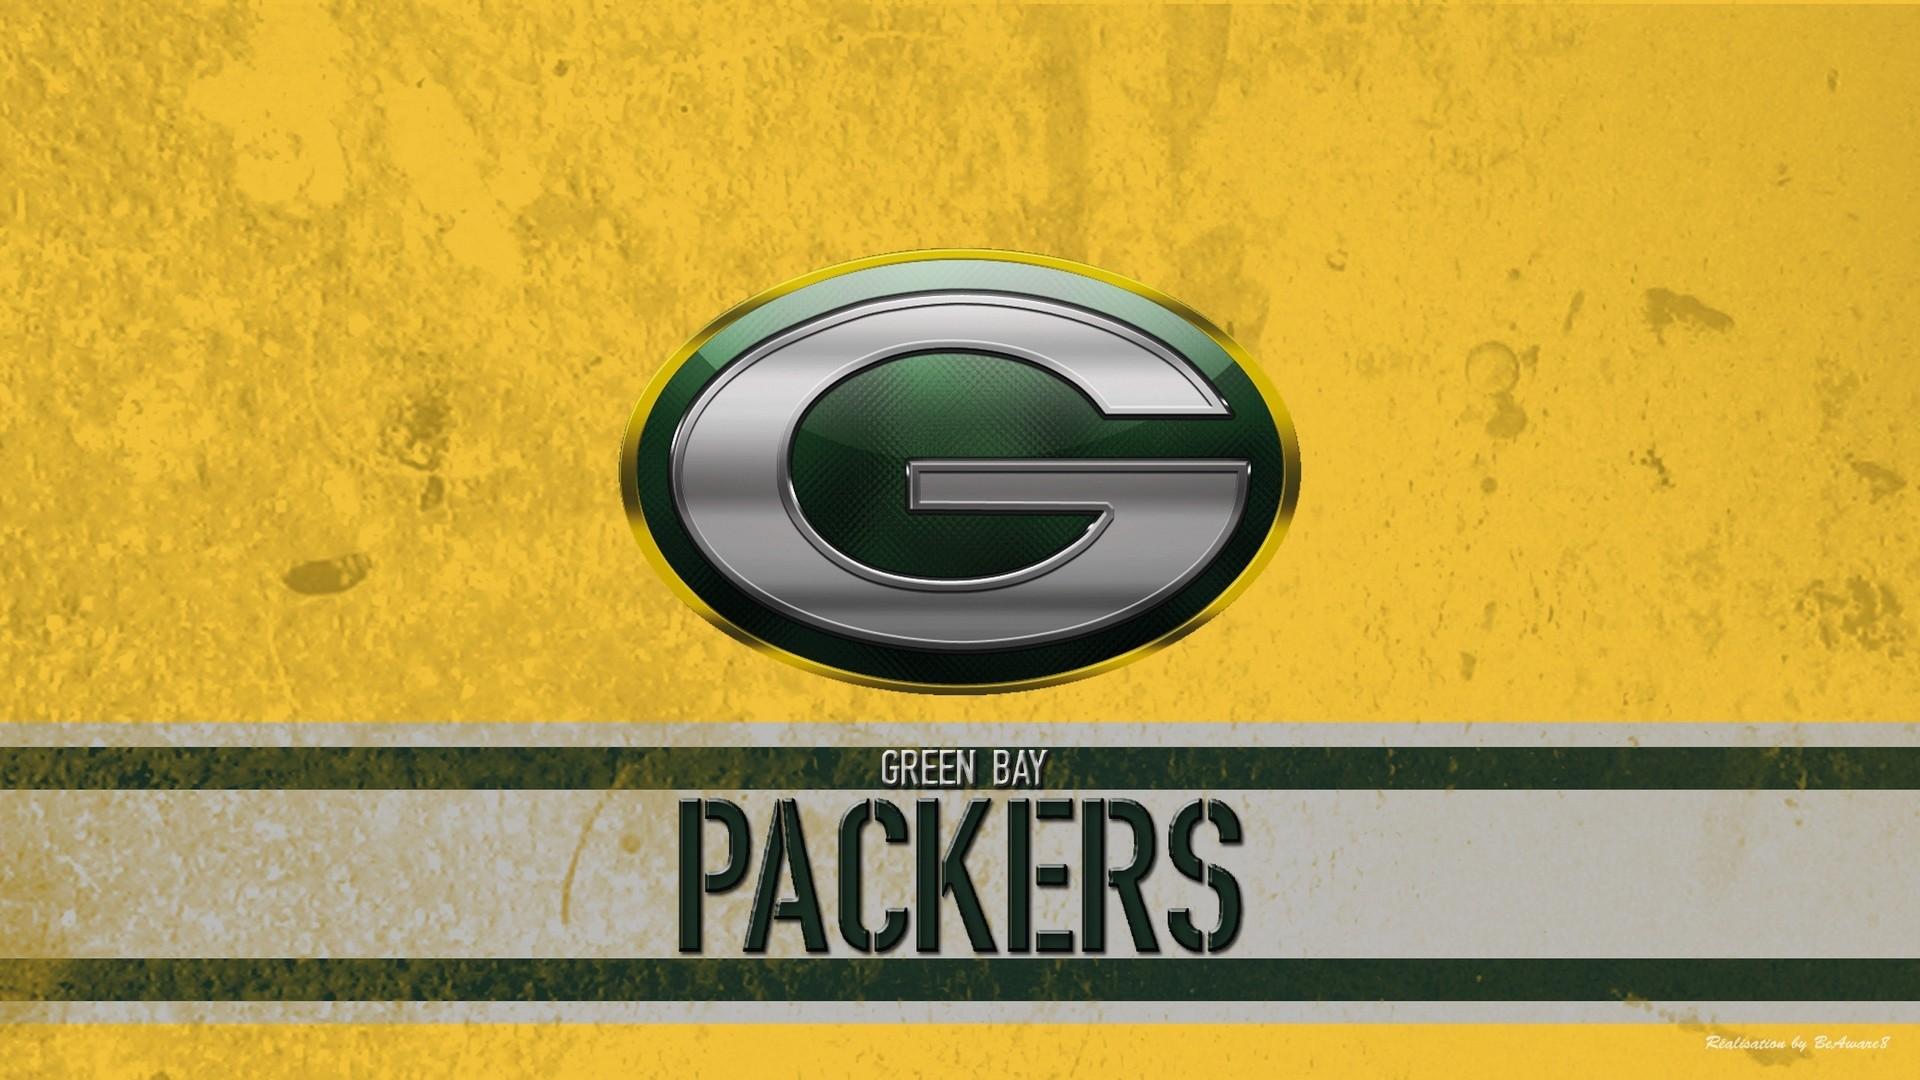 Green Bay Packers hd desktop wallpaper